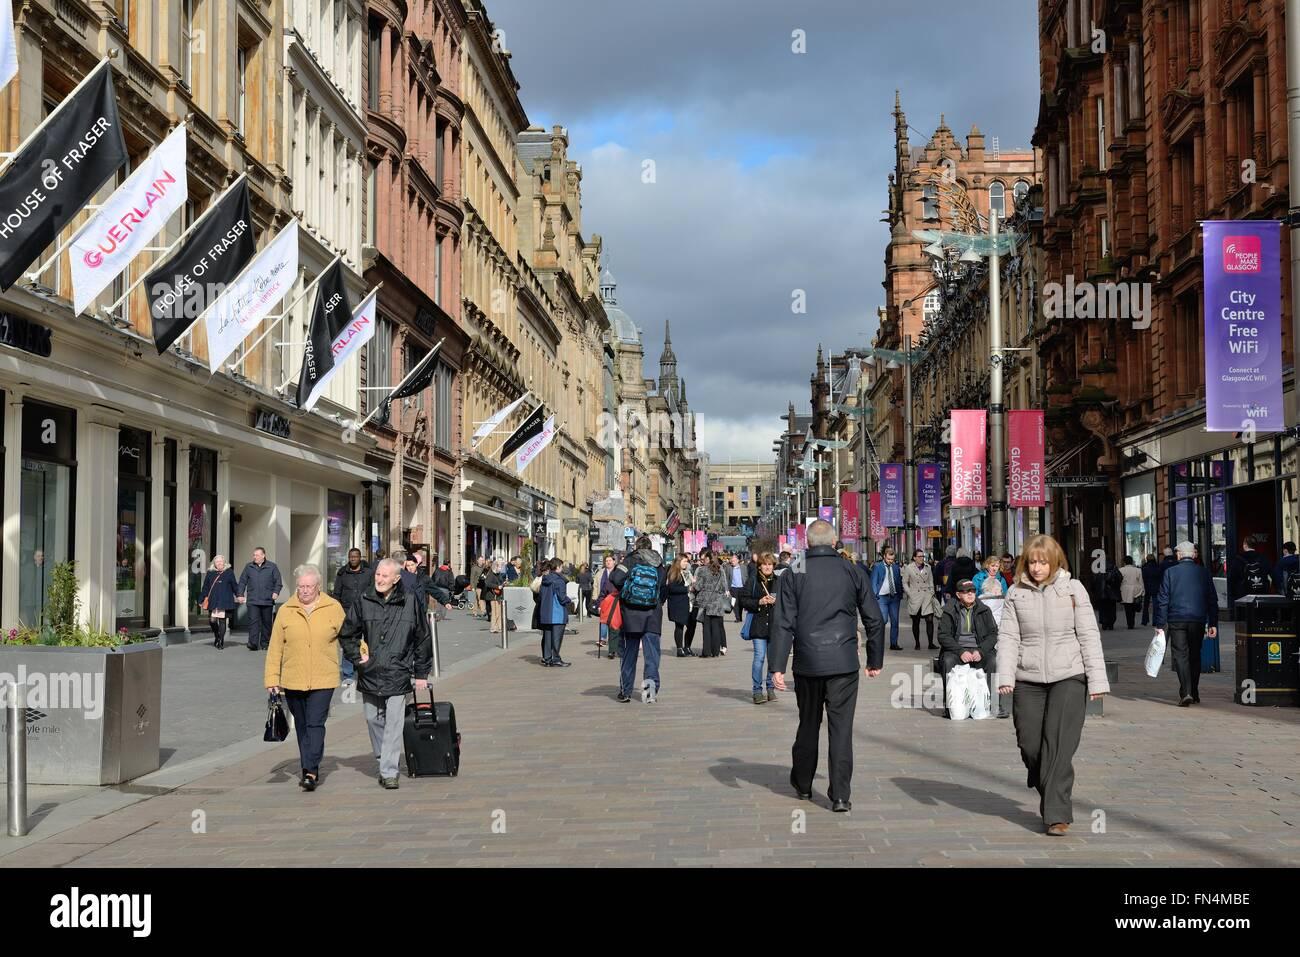 People walking on Buchanan Street shopping precinct in Glasgow Scotland, UK. - Stock Image